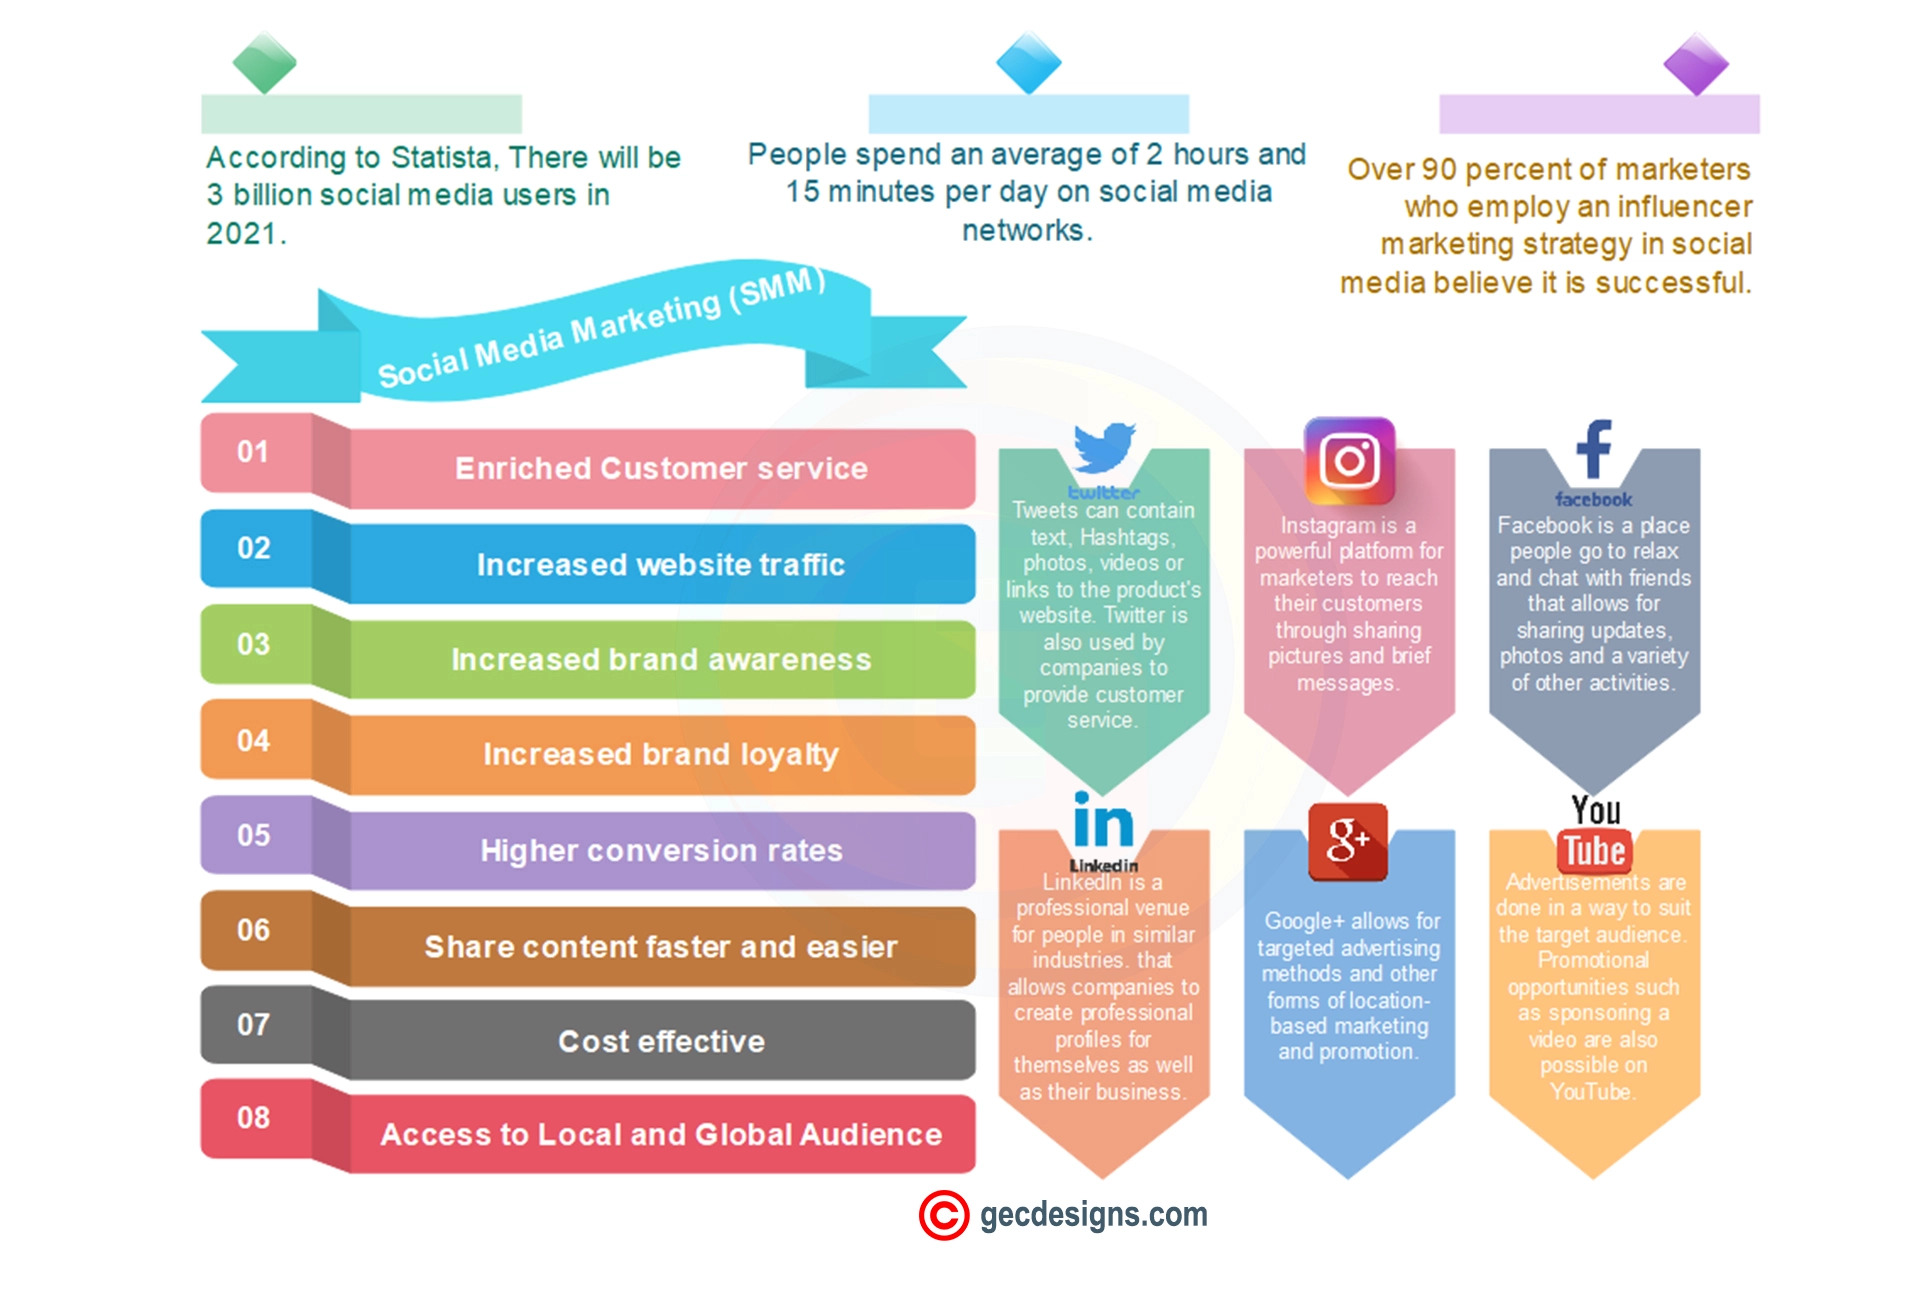 Social media Marketing benefits  Infographic Image